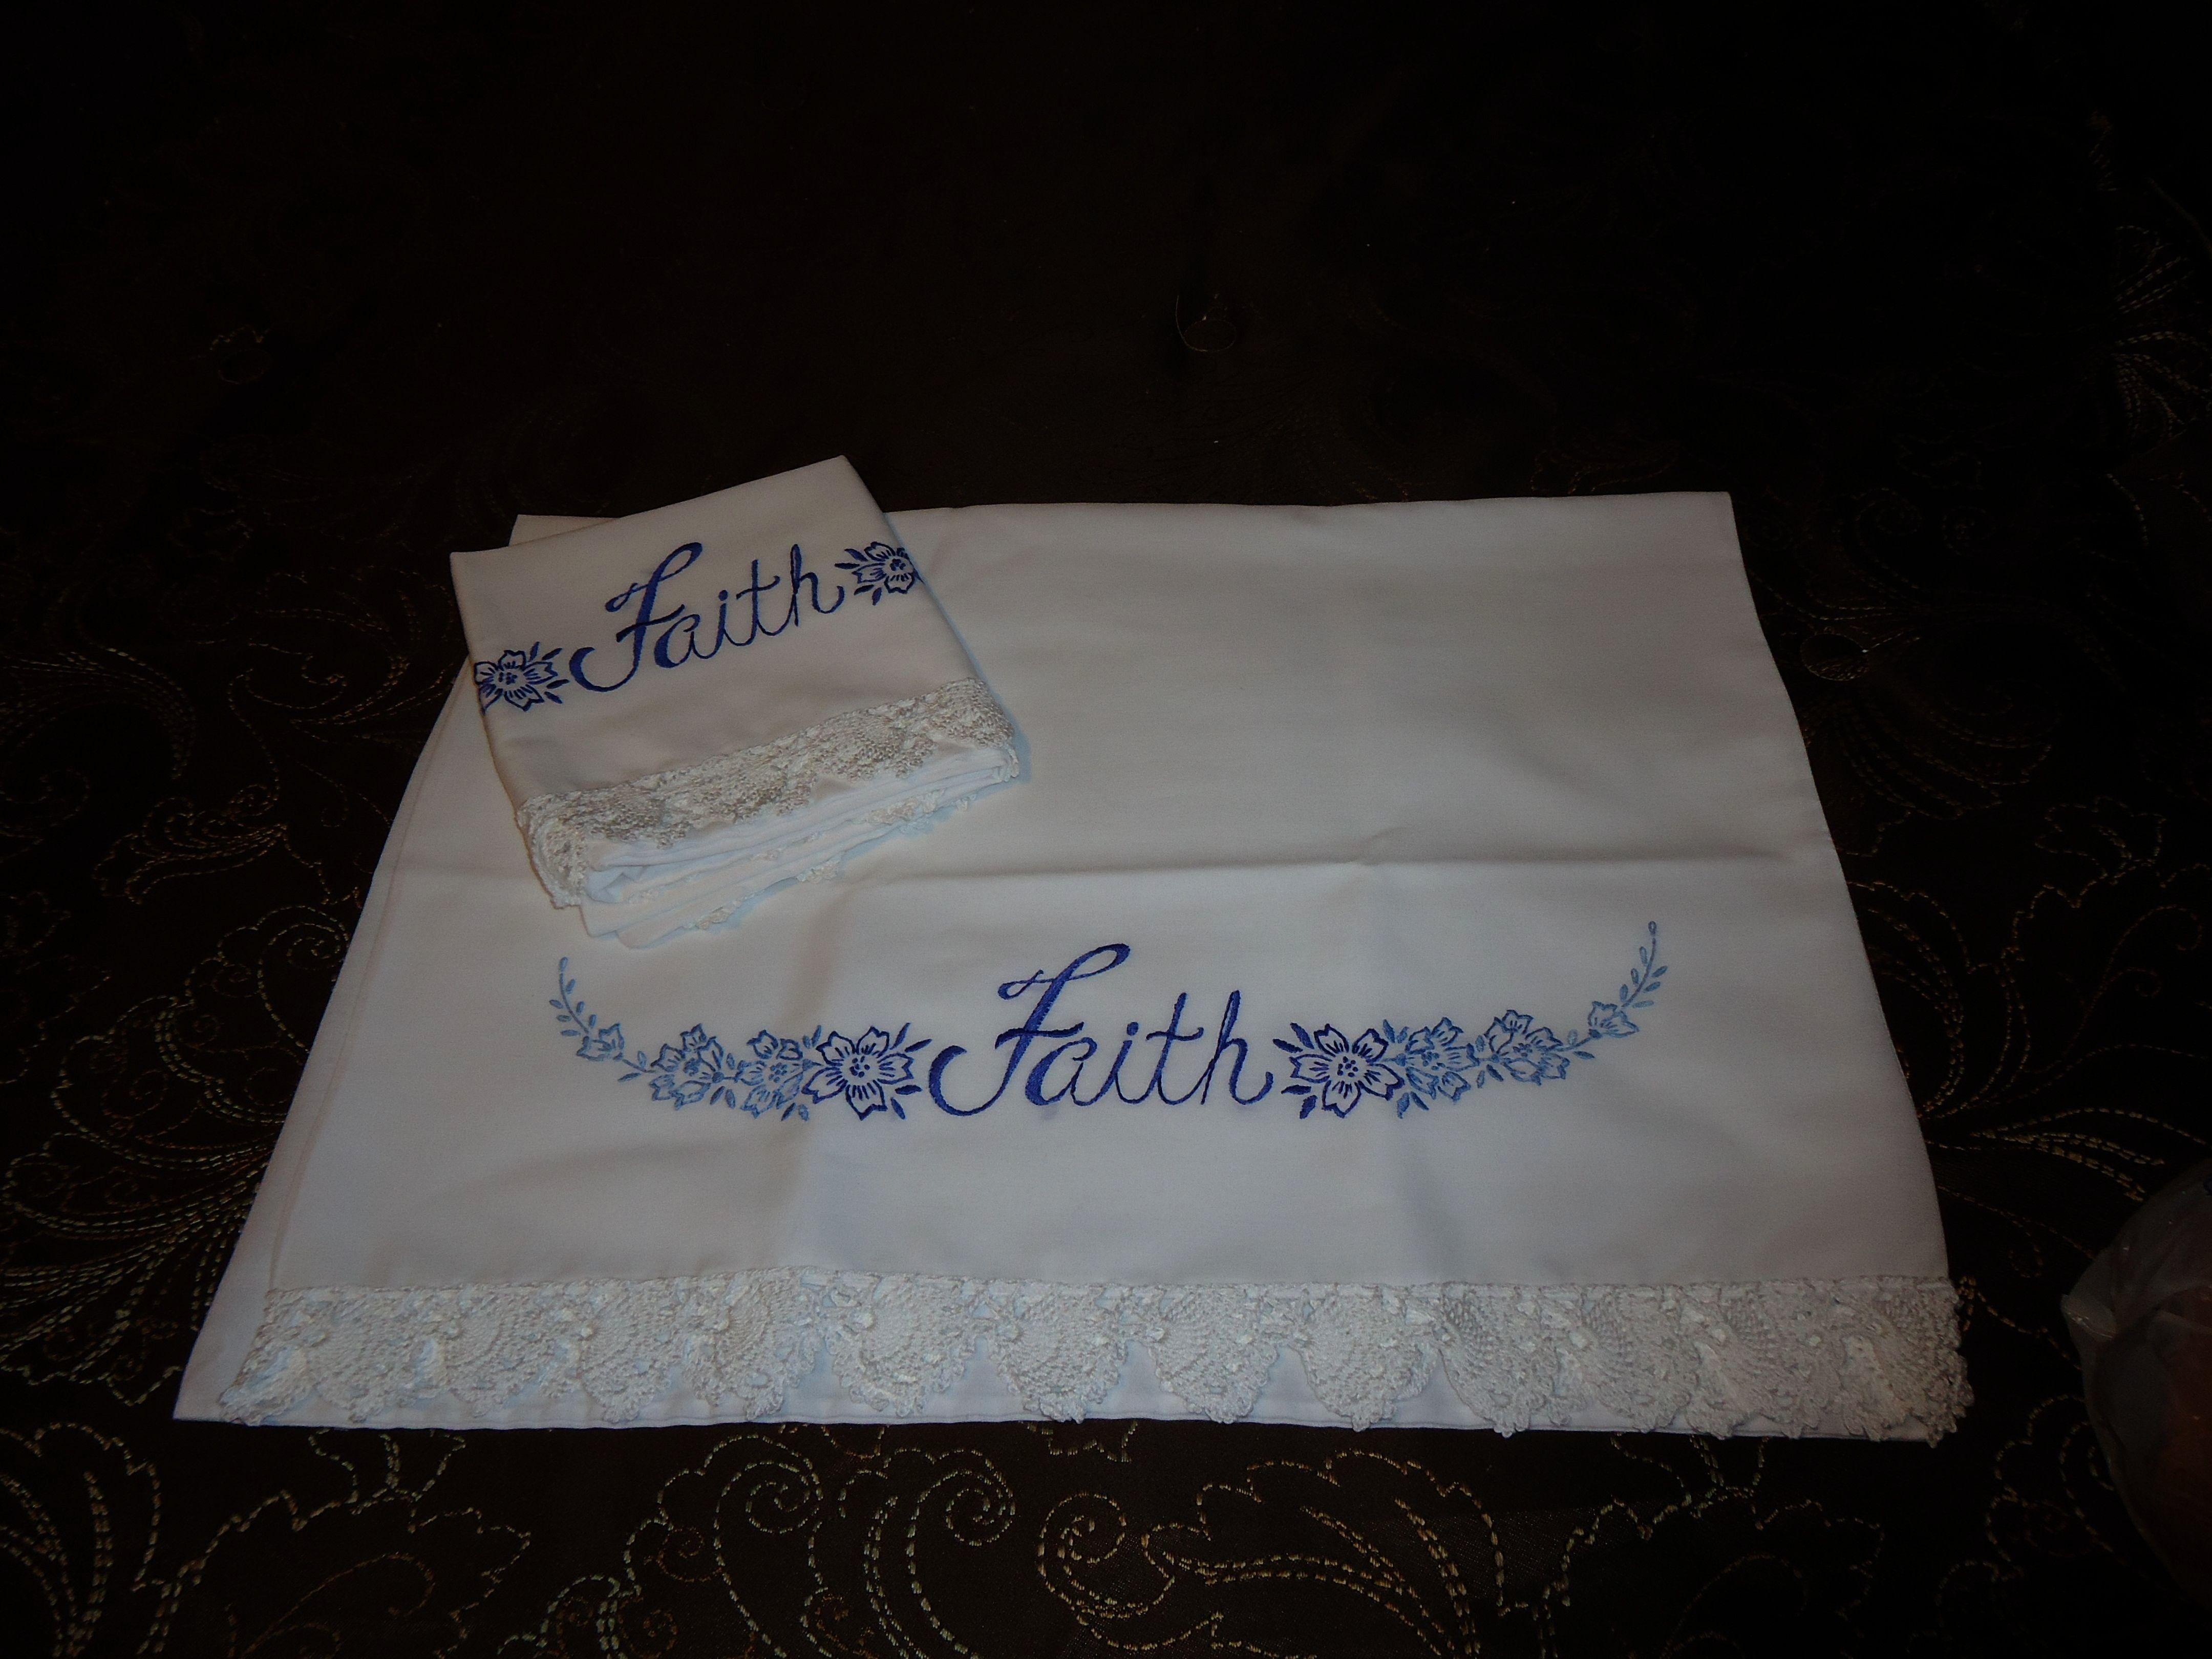 #pillowedgingcrochet #embroidery #crochet #pillow #edging #maeann #faith #case #edgi #and #by #cFaith pillow case, embroidery and crochet edging by Mae-Ann :  Faith pillow case... :  Faith pillow case, embroidery and crochet edging by Mae-Ann :  Faith pillow case… :  Faith pillow case, embroidery and crochet edging by Mae-Ann :  Faith pillow case… :  Faith pillow case, embroidery and crochet edging by Mae-Ann :  Faith pillow case, embroidery and crochet edging by Mae-Ann   Faith pillow cFaith pi #pillowedgingcrochet